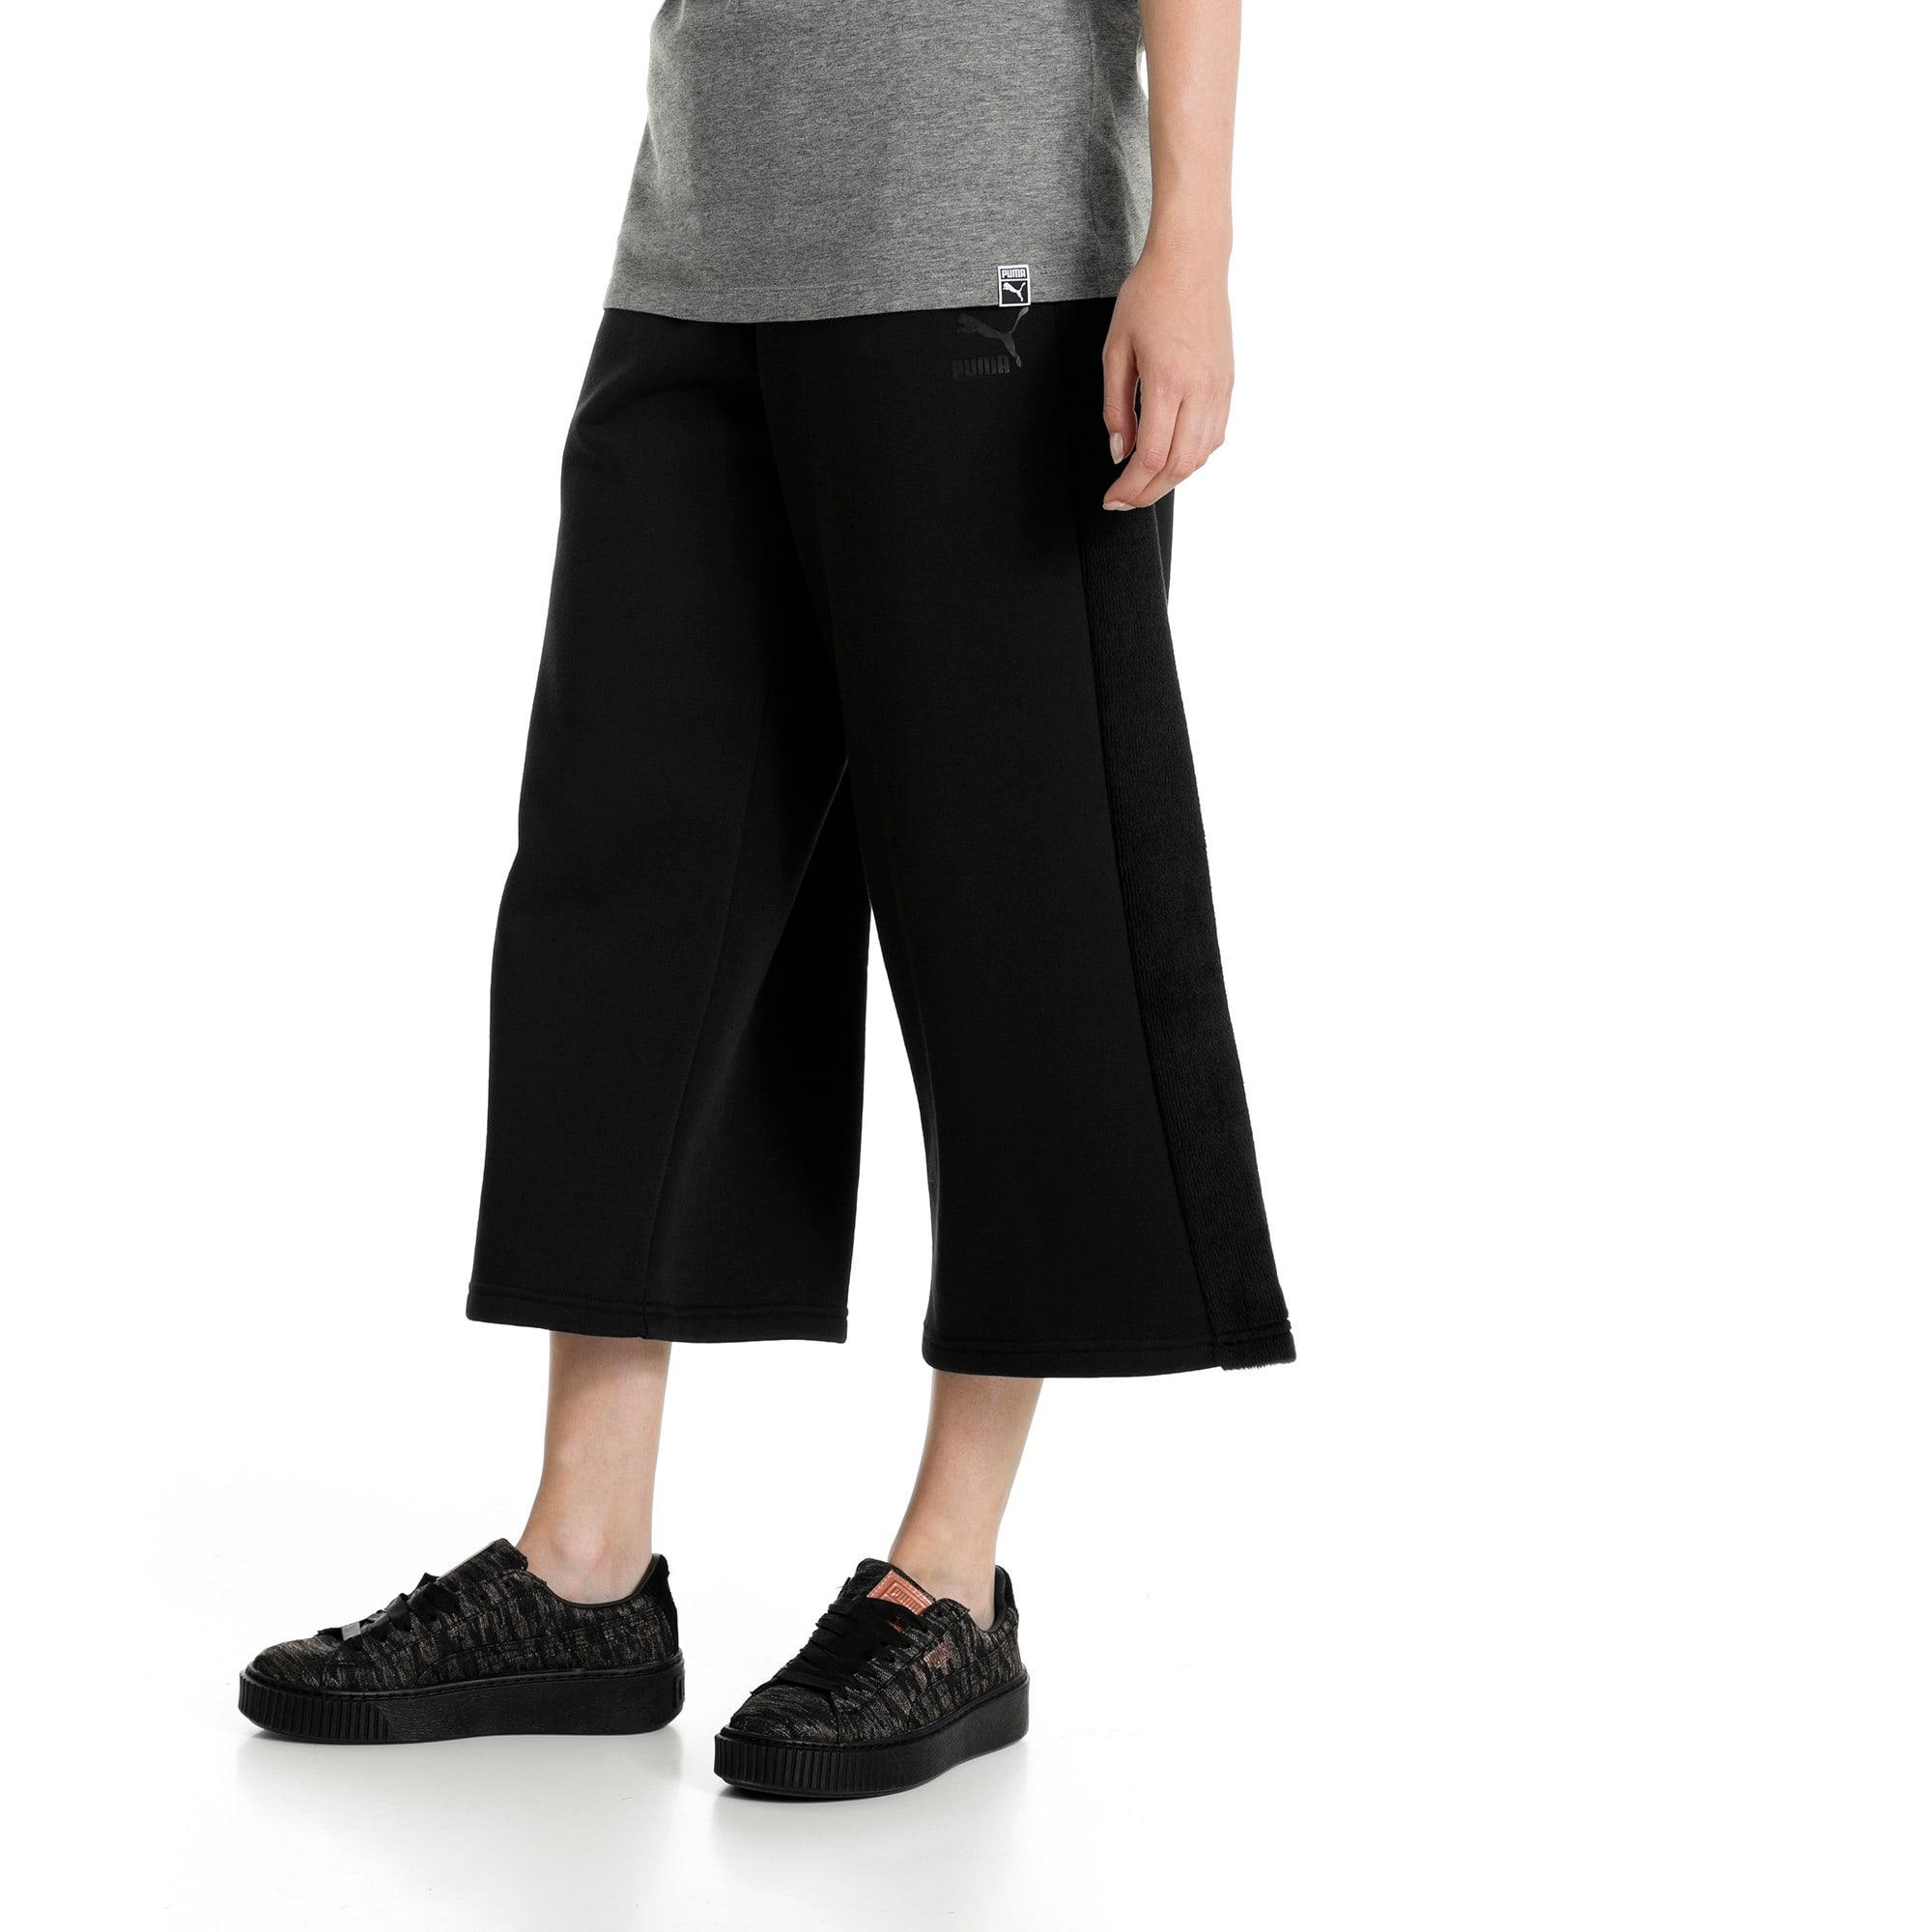 Thumbnail 2 of Classics Women's Winterized Archive Logo T7 Pants, Cotton Black, medium-IND